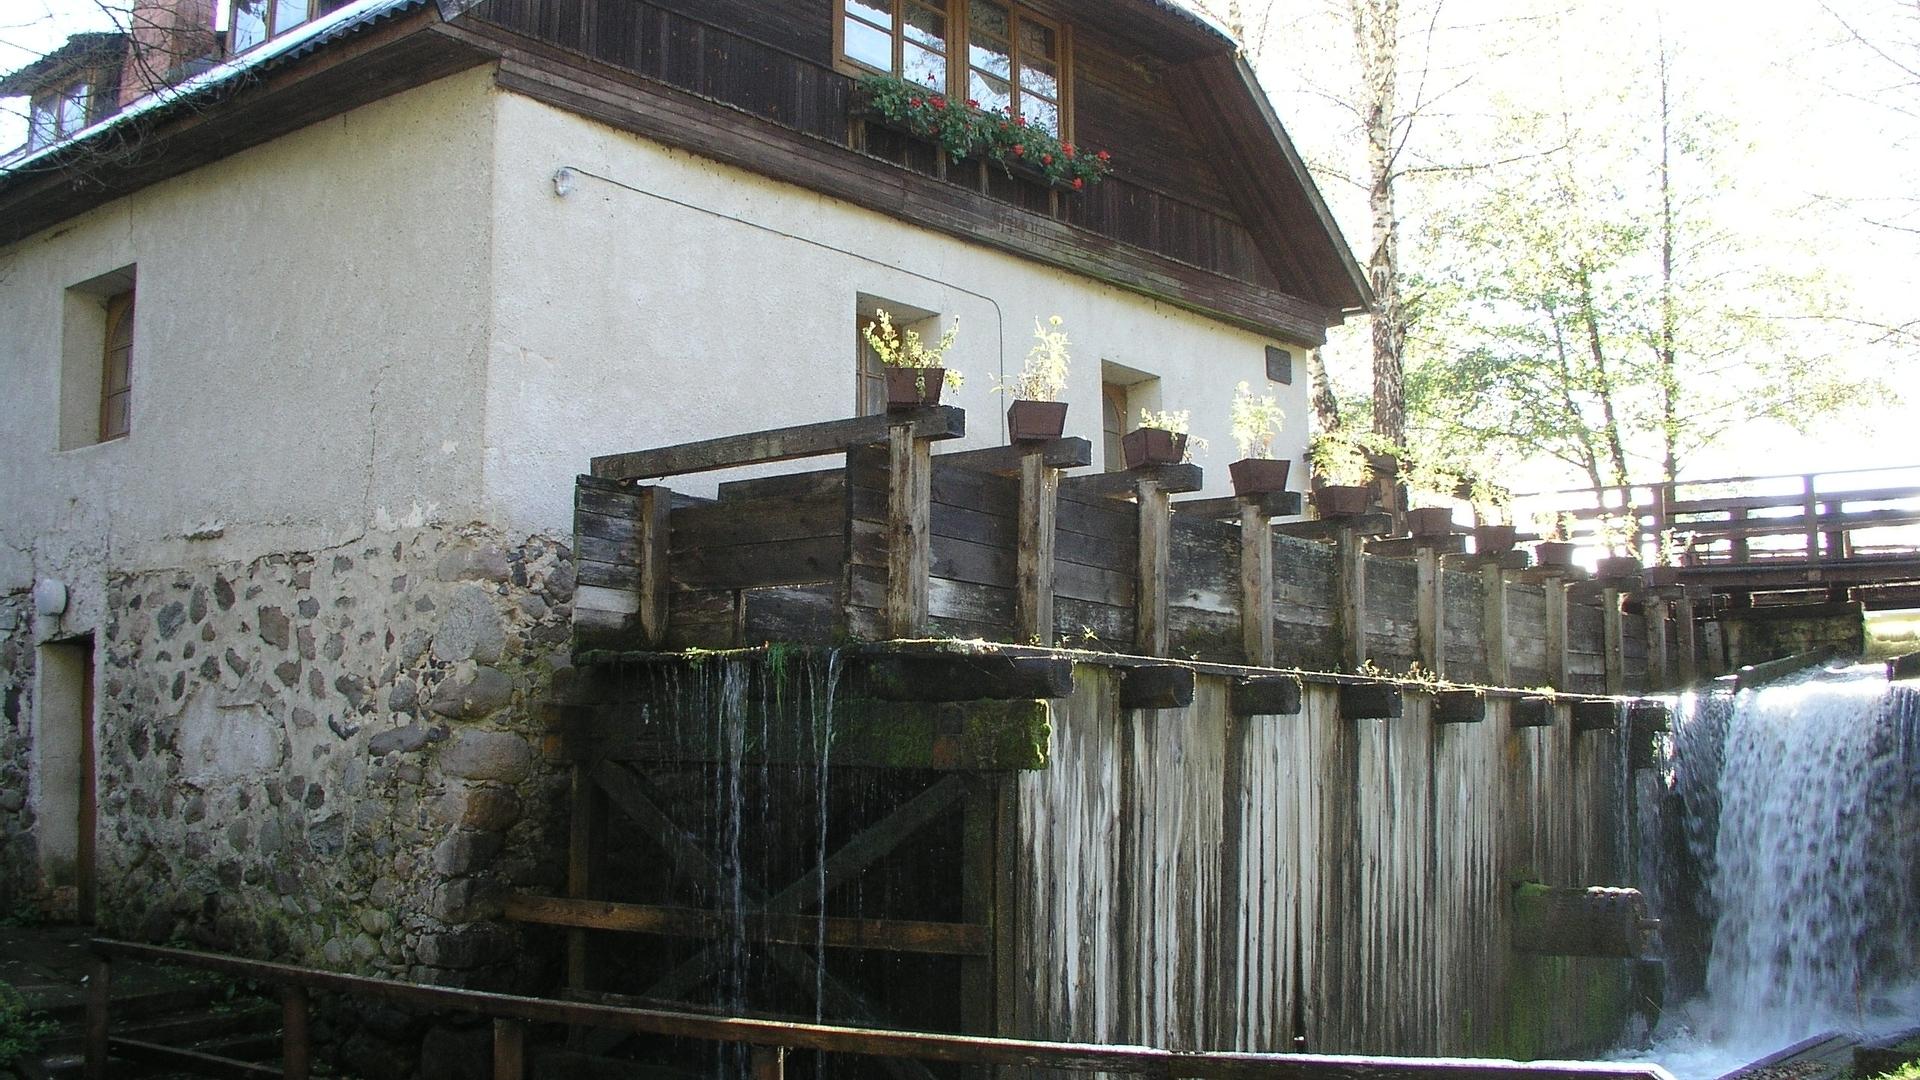 Gaveikėnai Wassermühle